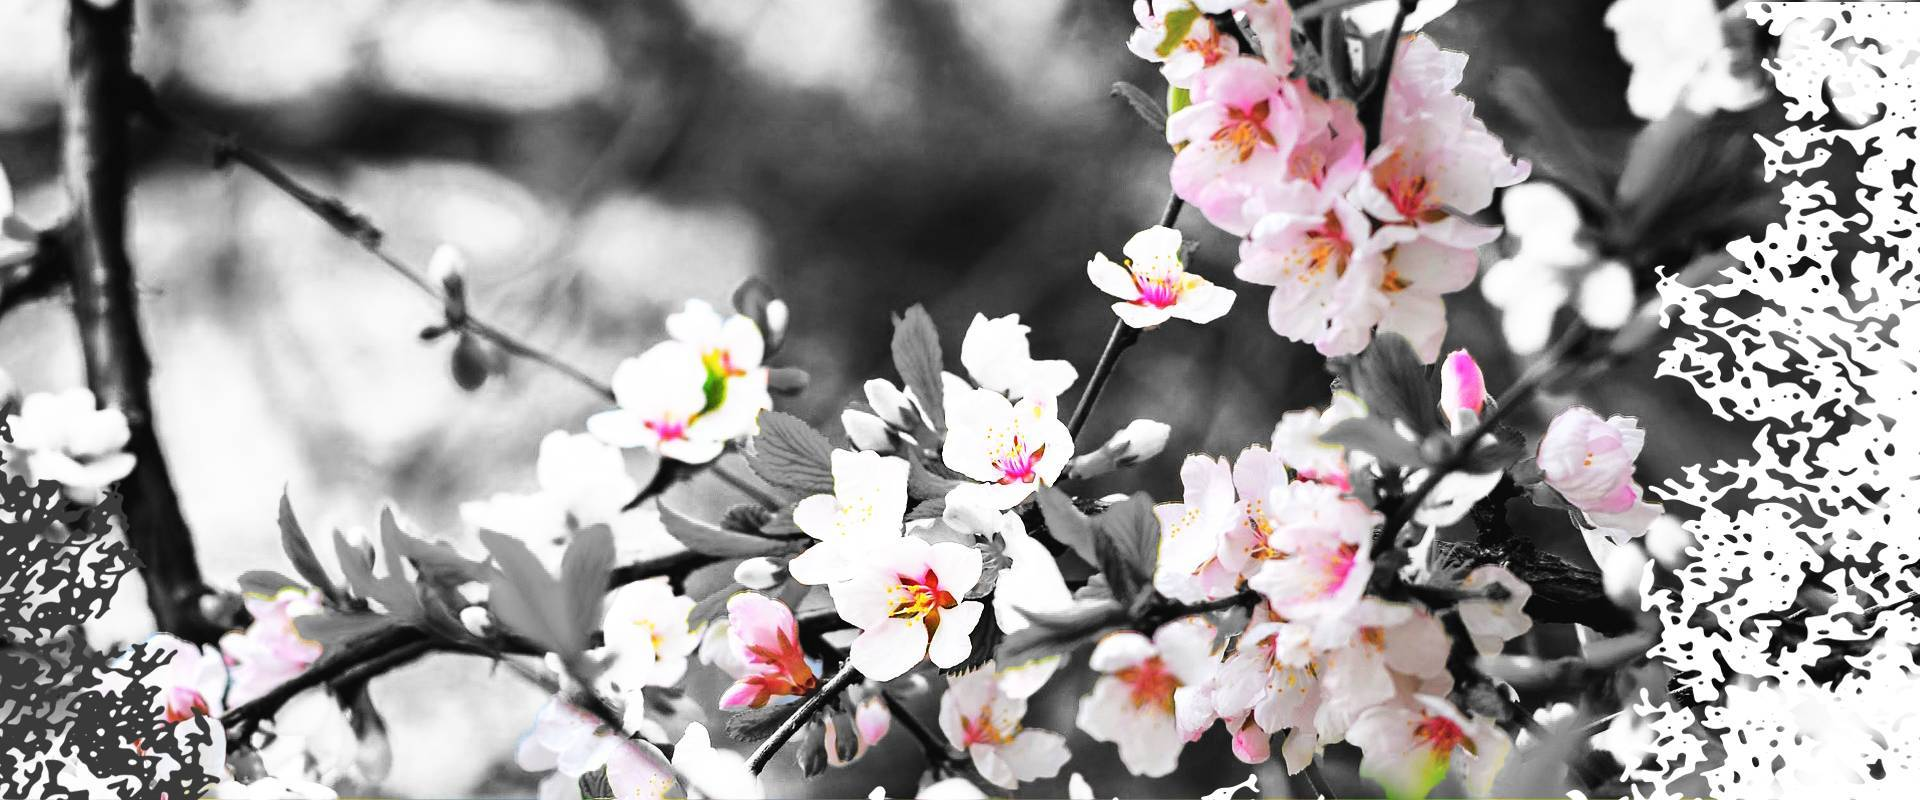 Cerisier en fleur - Budo Club Chartrain